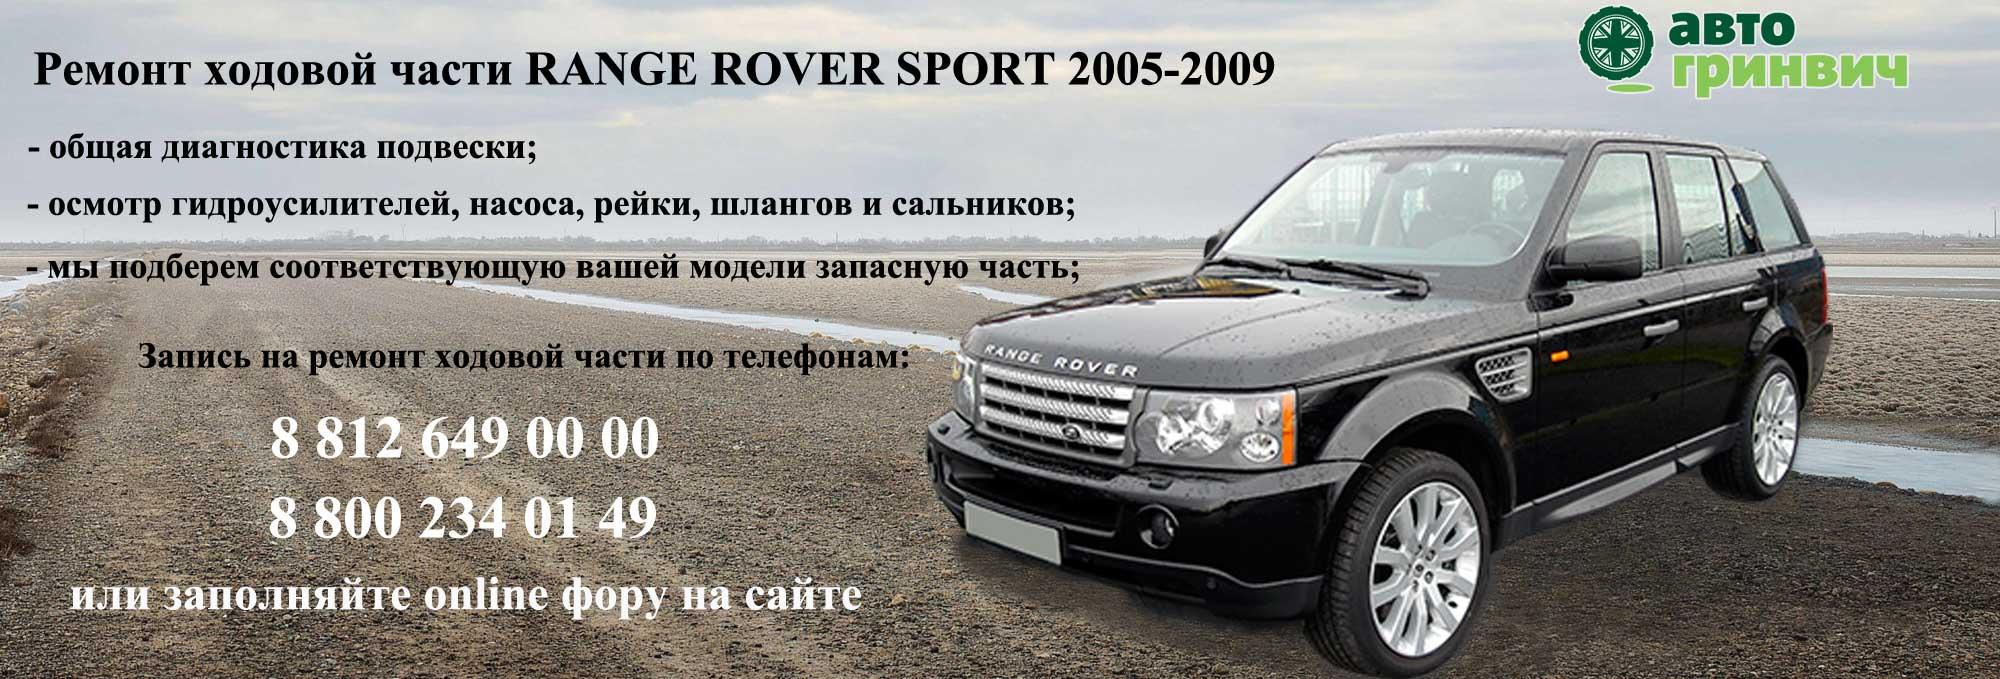 Ремонт ходовой части RANGE ROVER SPORT 2005-2009